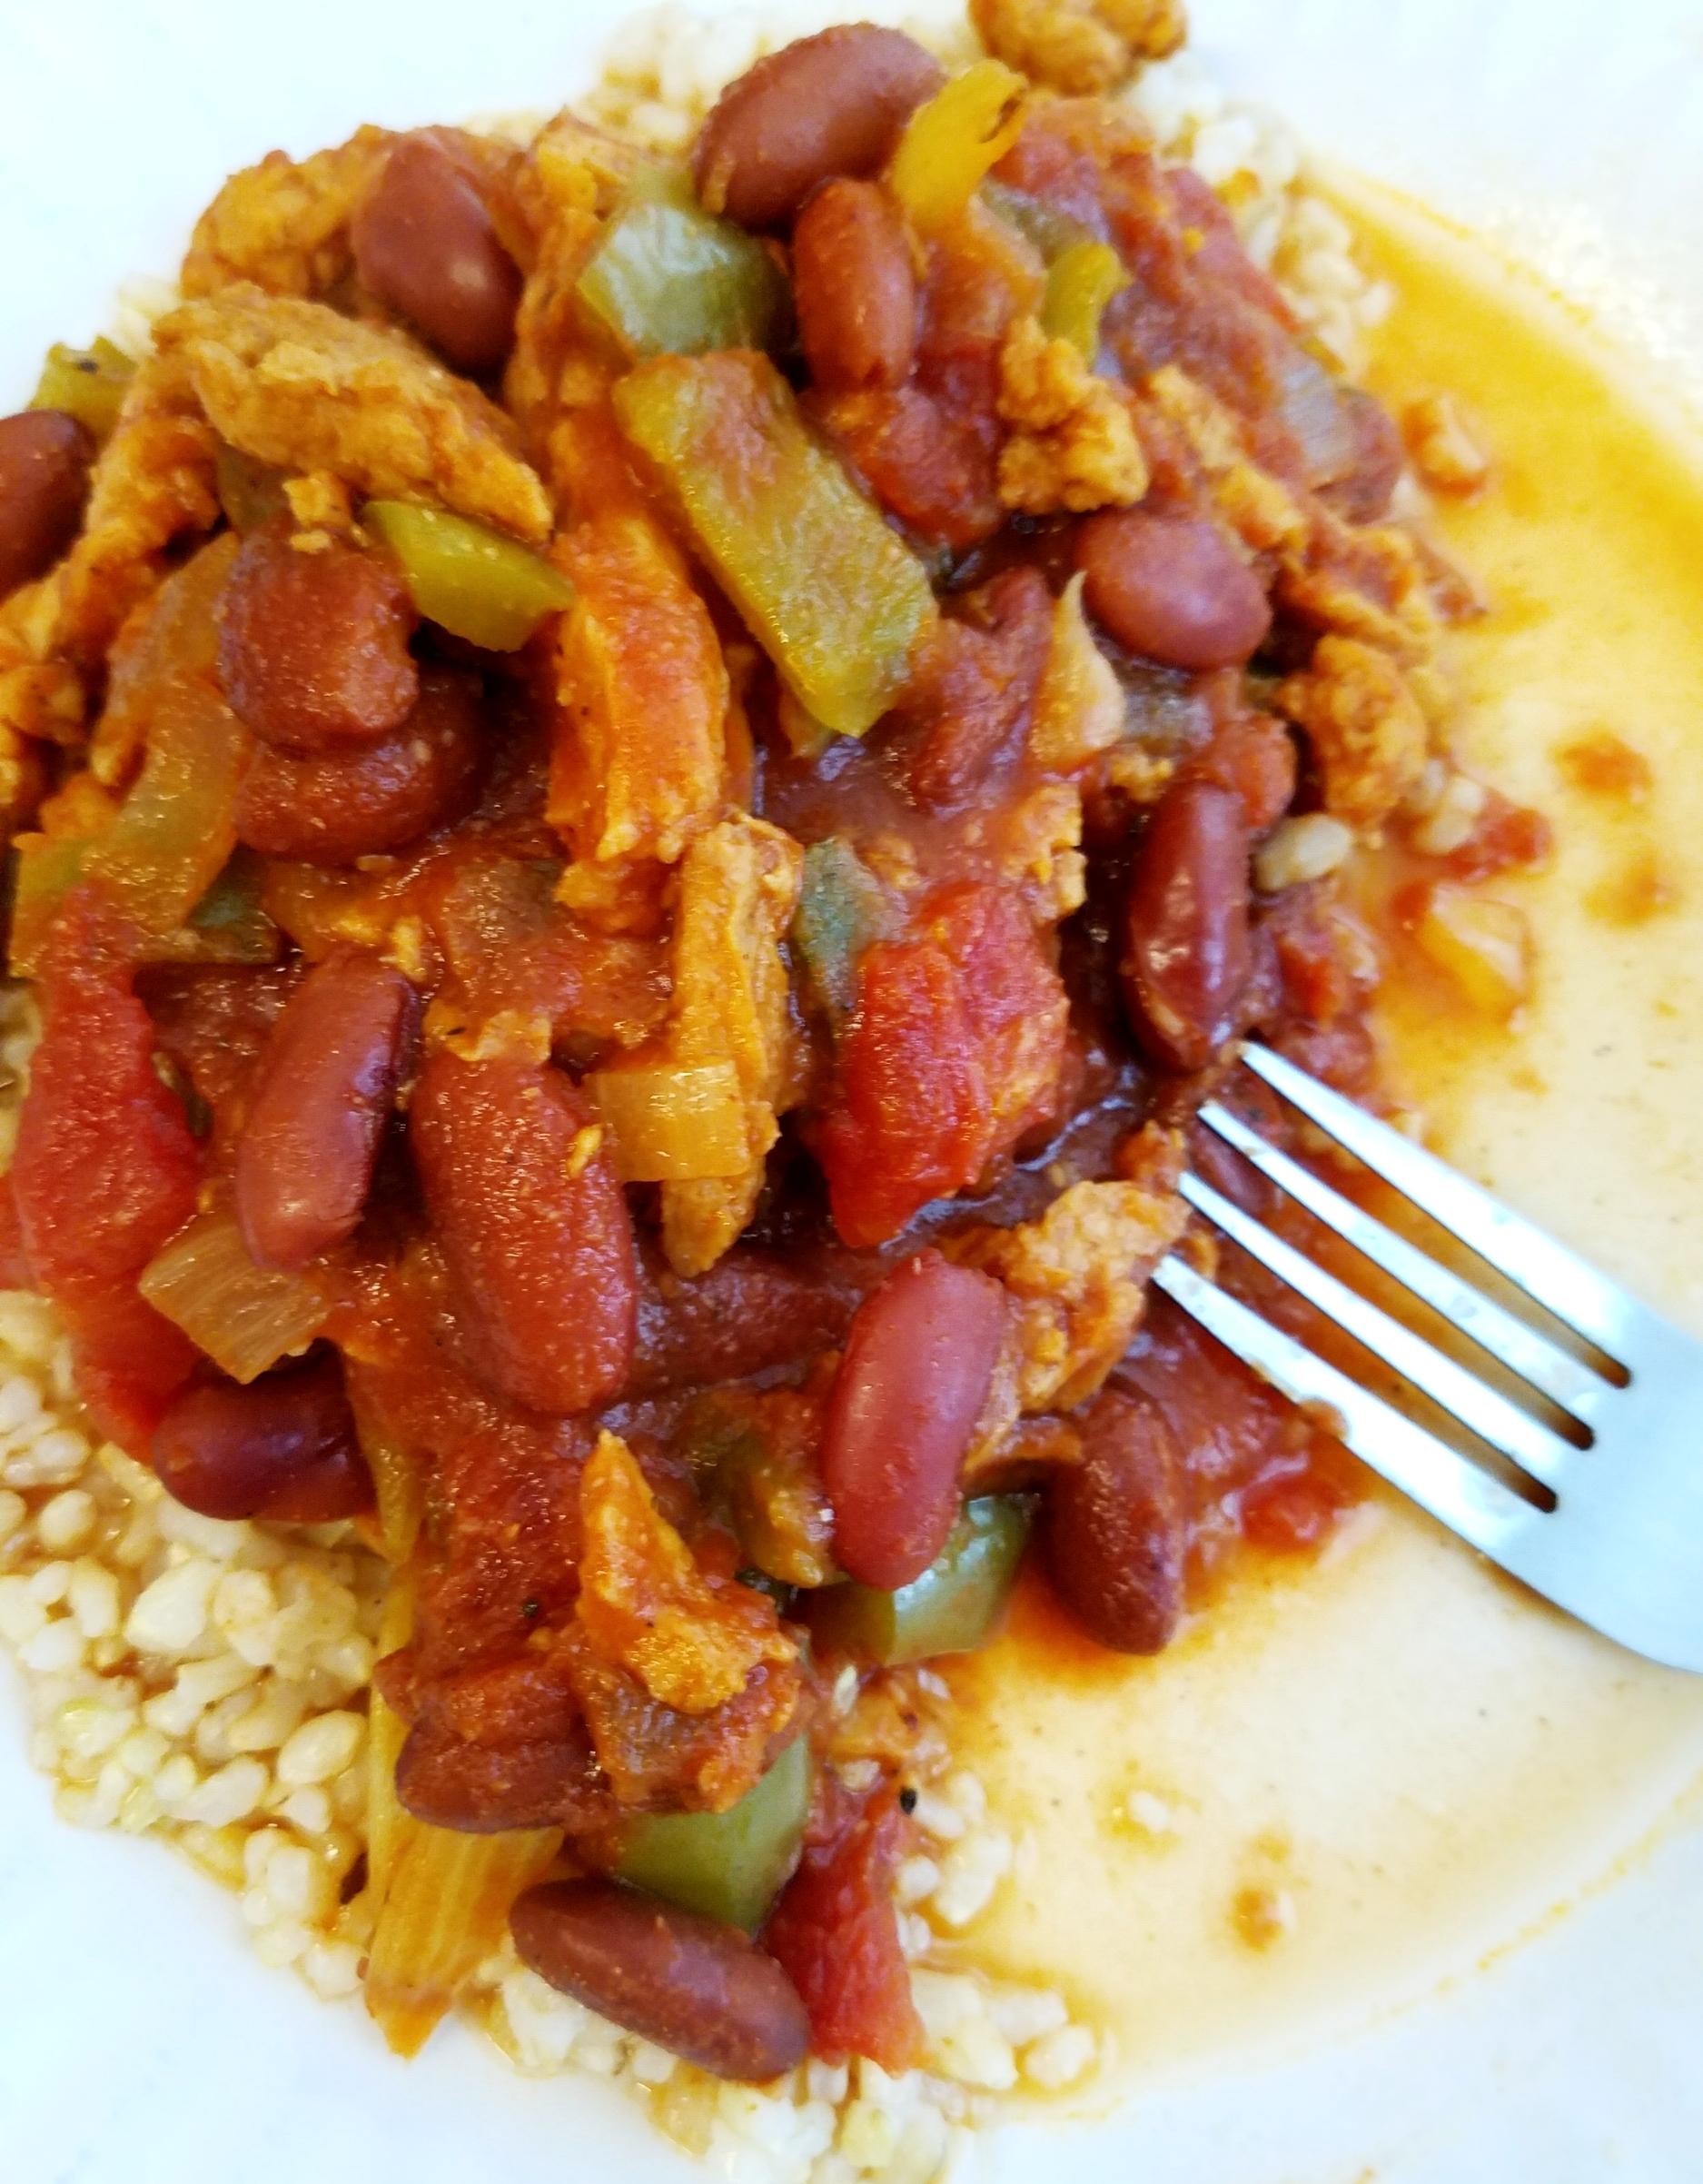 Cajun Kidney Beans and Brown Rice